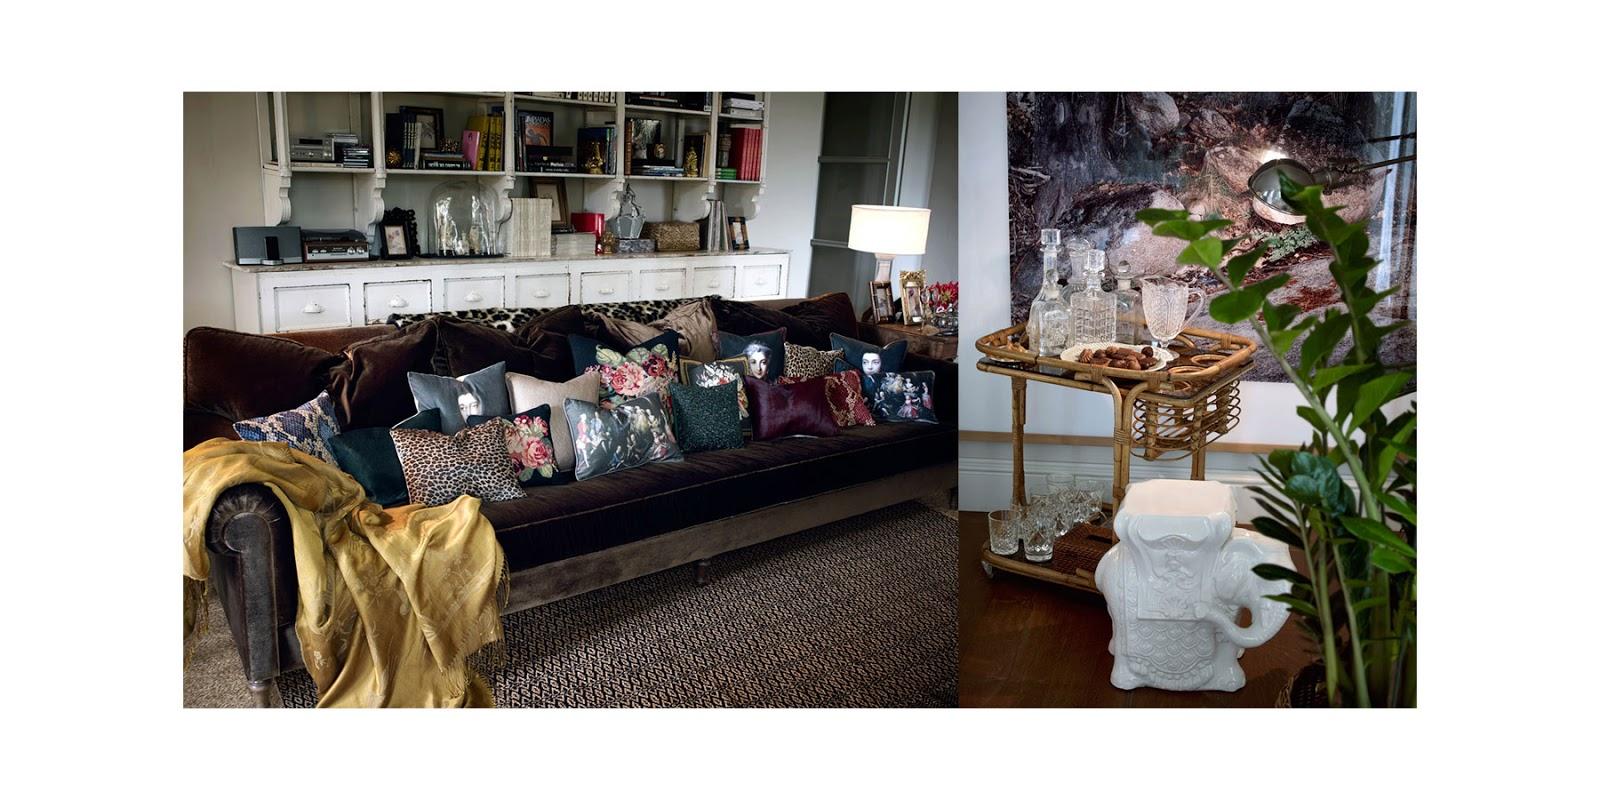 jildou bijsterbosch zara home fall winter 2013 part 2. Black Bedroom Furniture Sets. Home Design Ideas